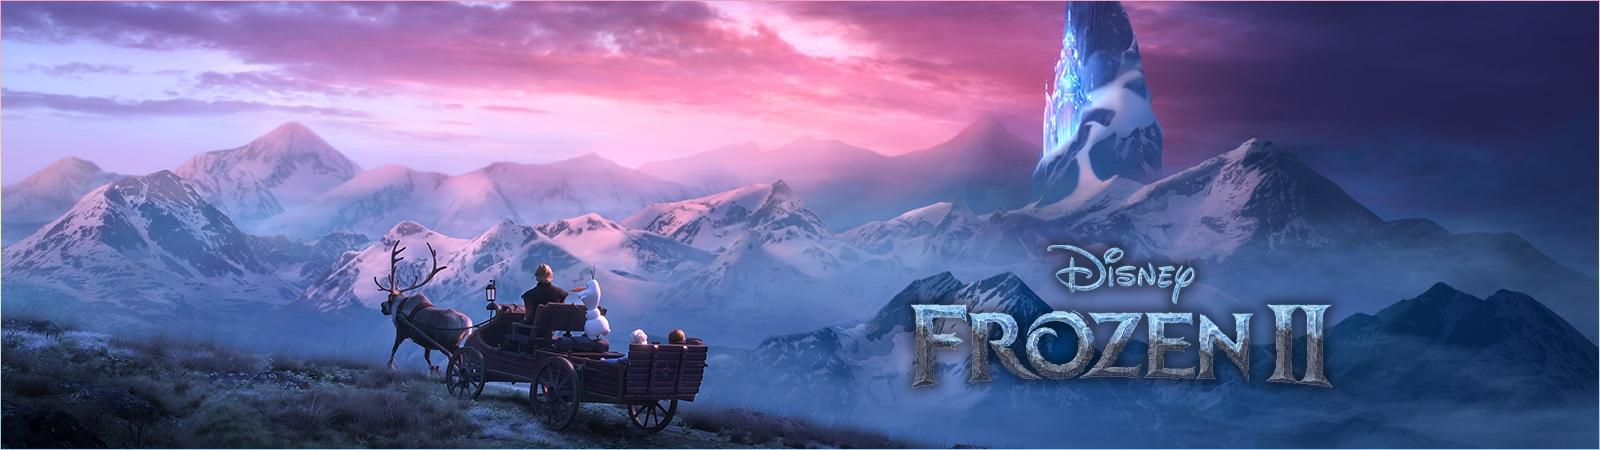 Comprar juguetes Frozen 2 online   Envios Gratis desde 49€